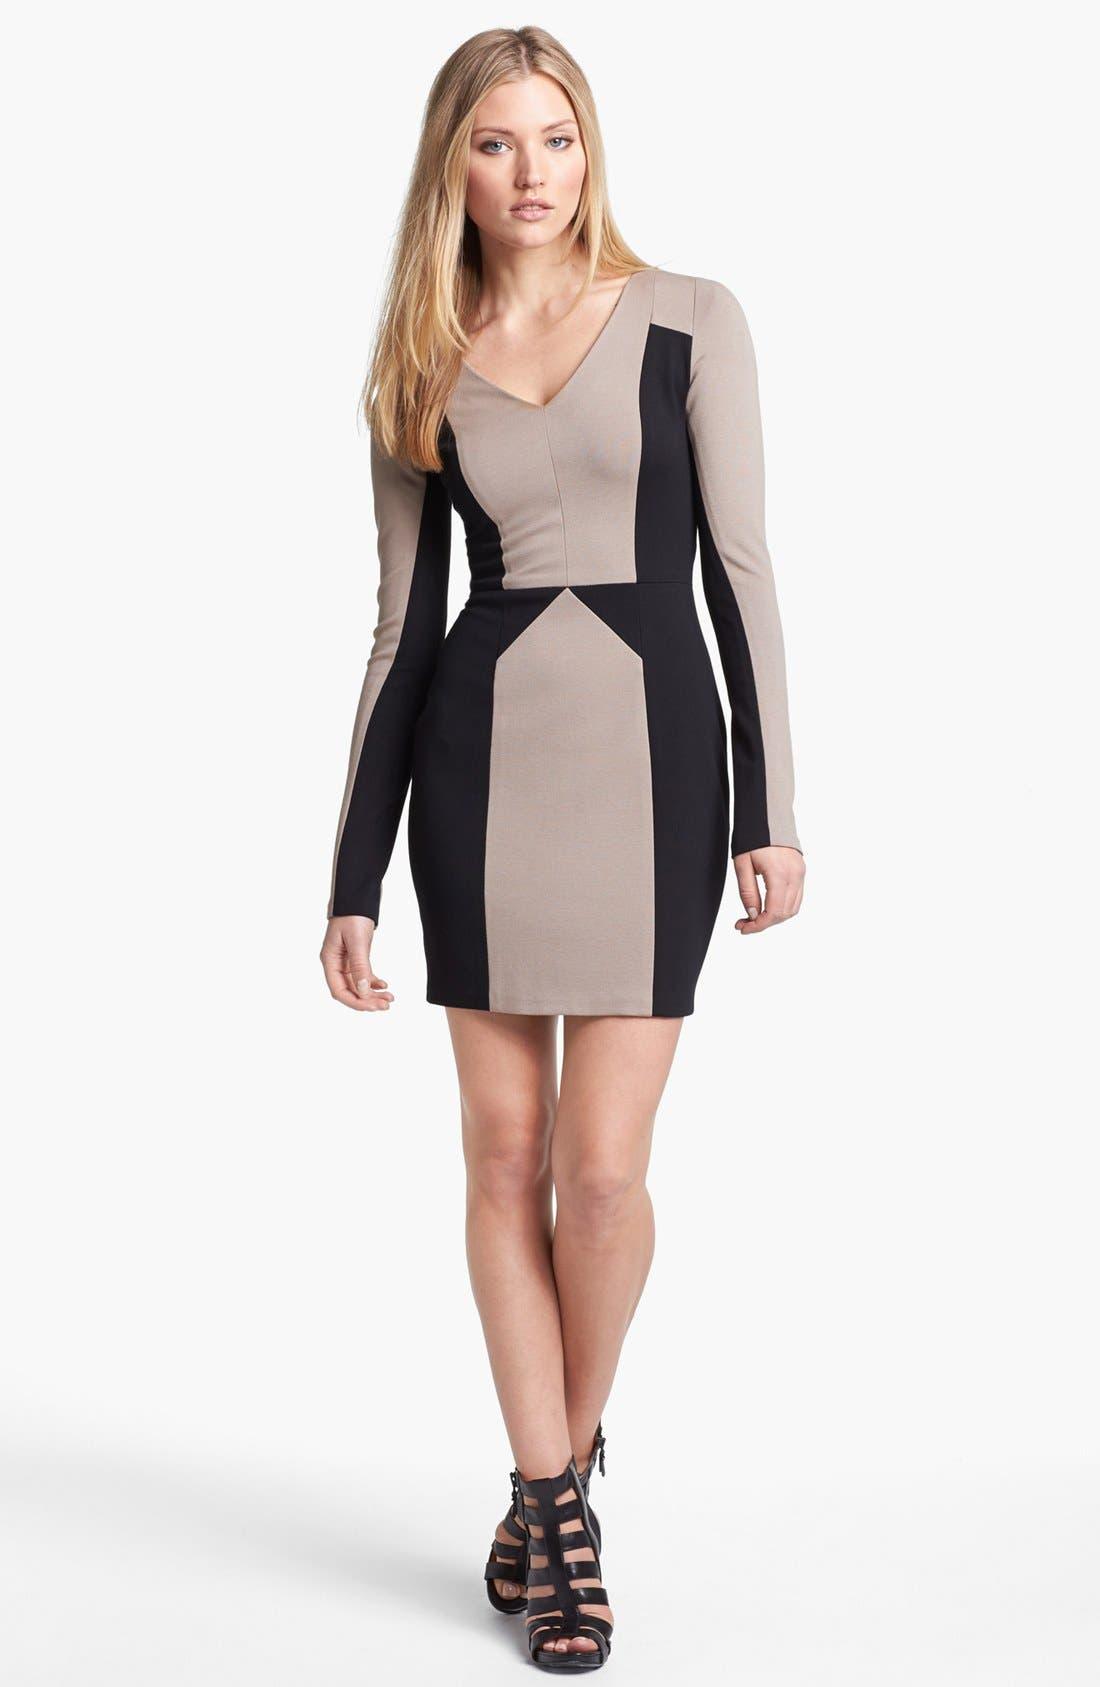 Alternate Image 1 Selected - Rebecca Minkoff 'Harriet' Stretch Body-Con Dress